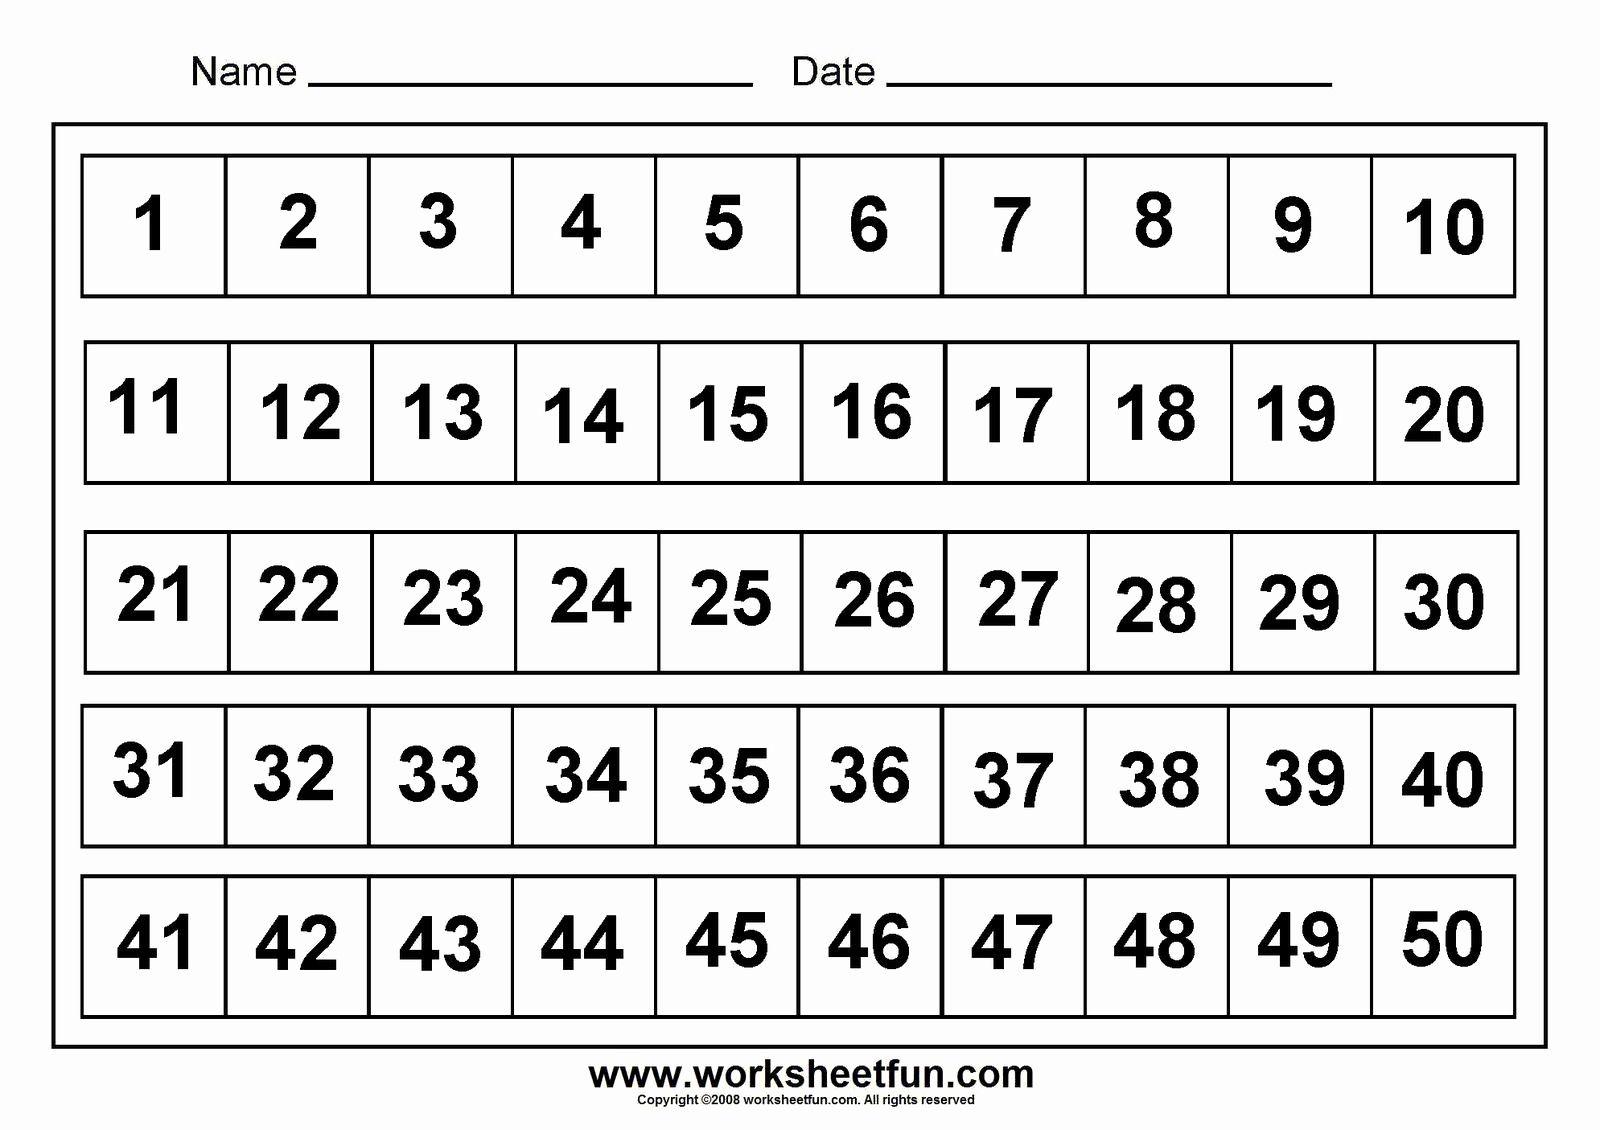 50 Number Charts Menulis Number chart worksheets half inch